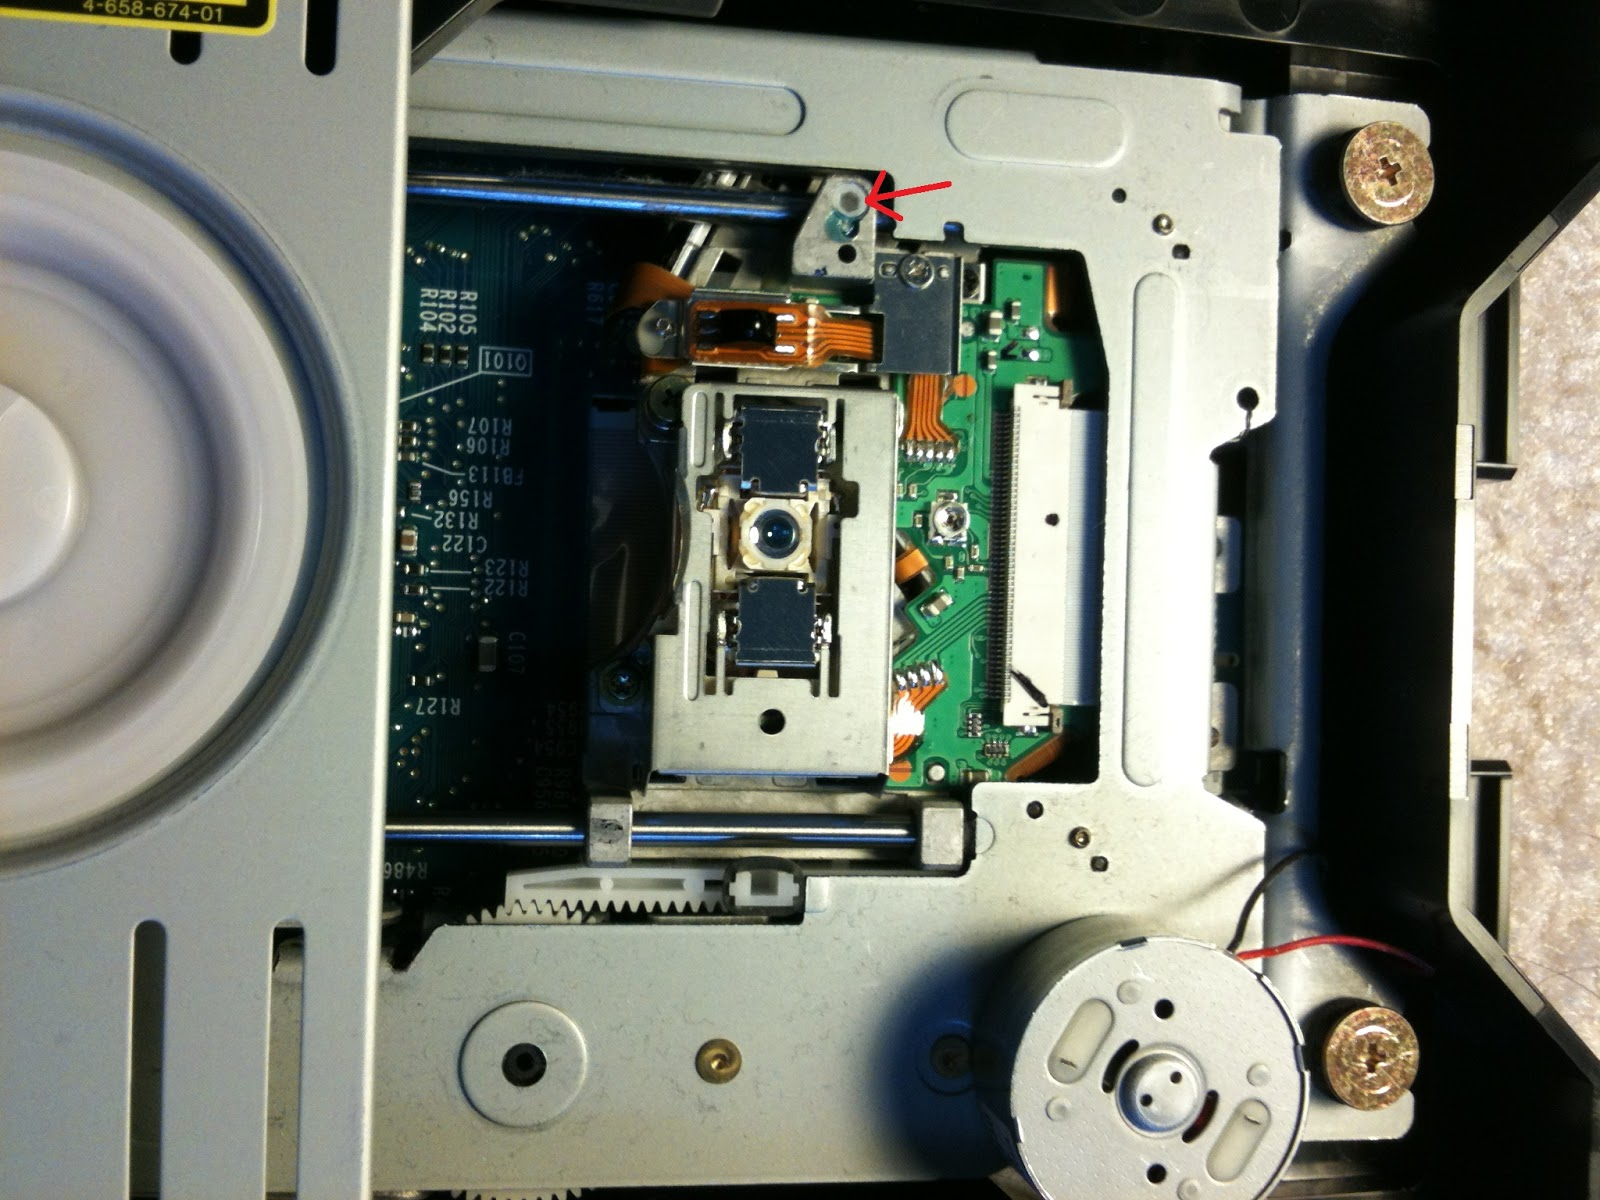 Sony DW-U15A Drive with grub screw adjusting location